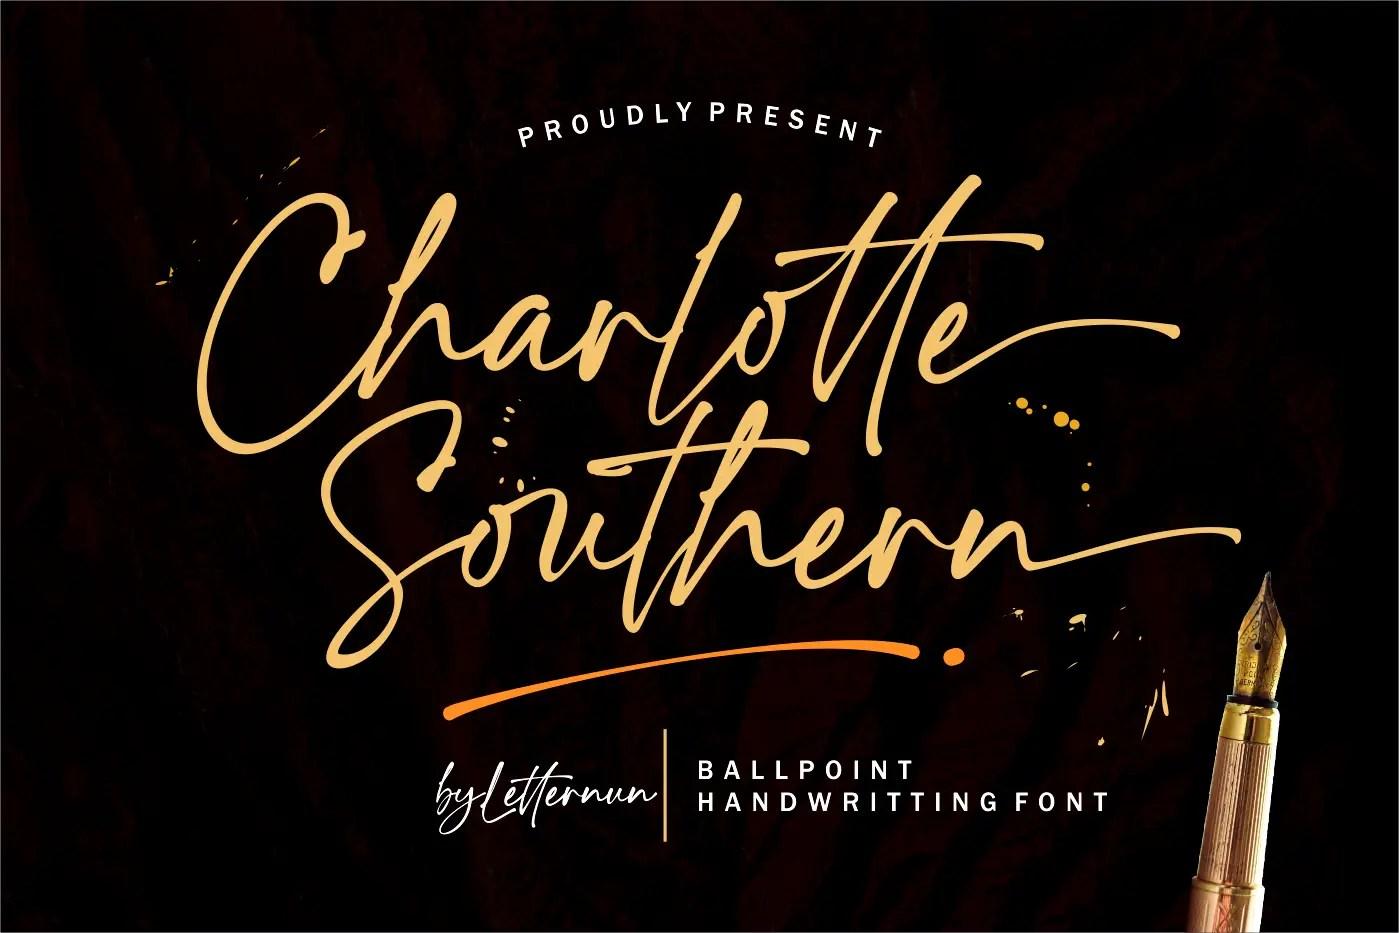 Charlotte Southern Handwritten Font -1